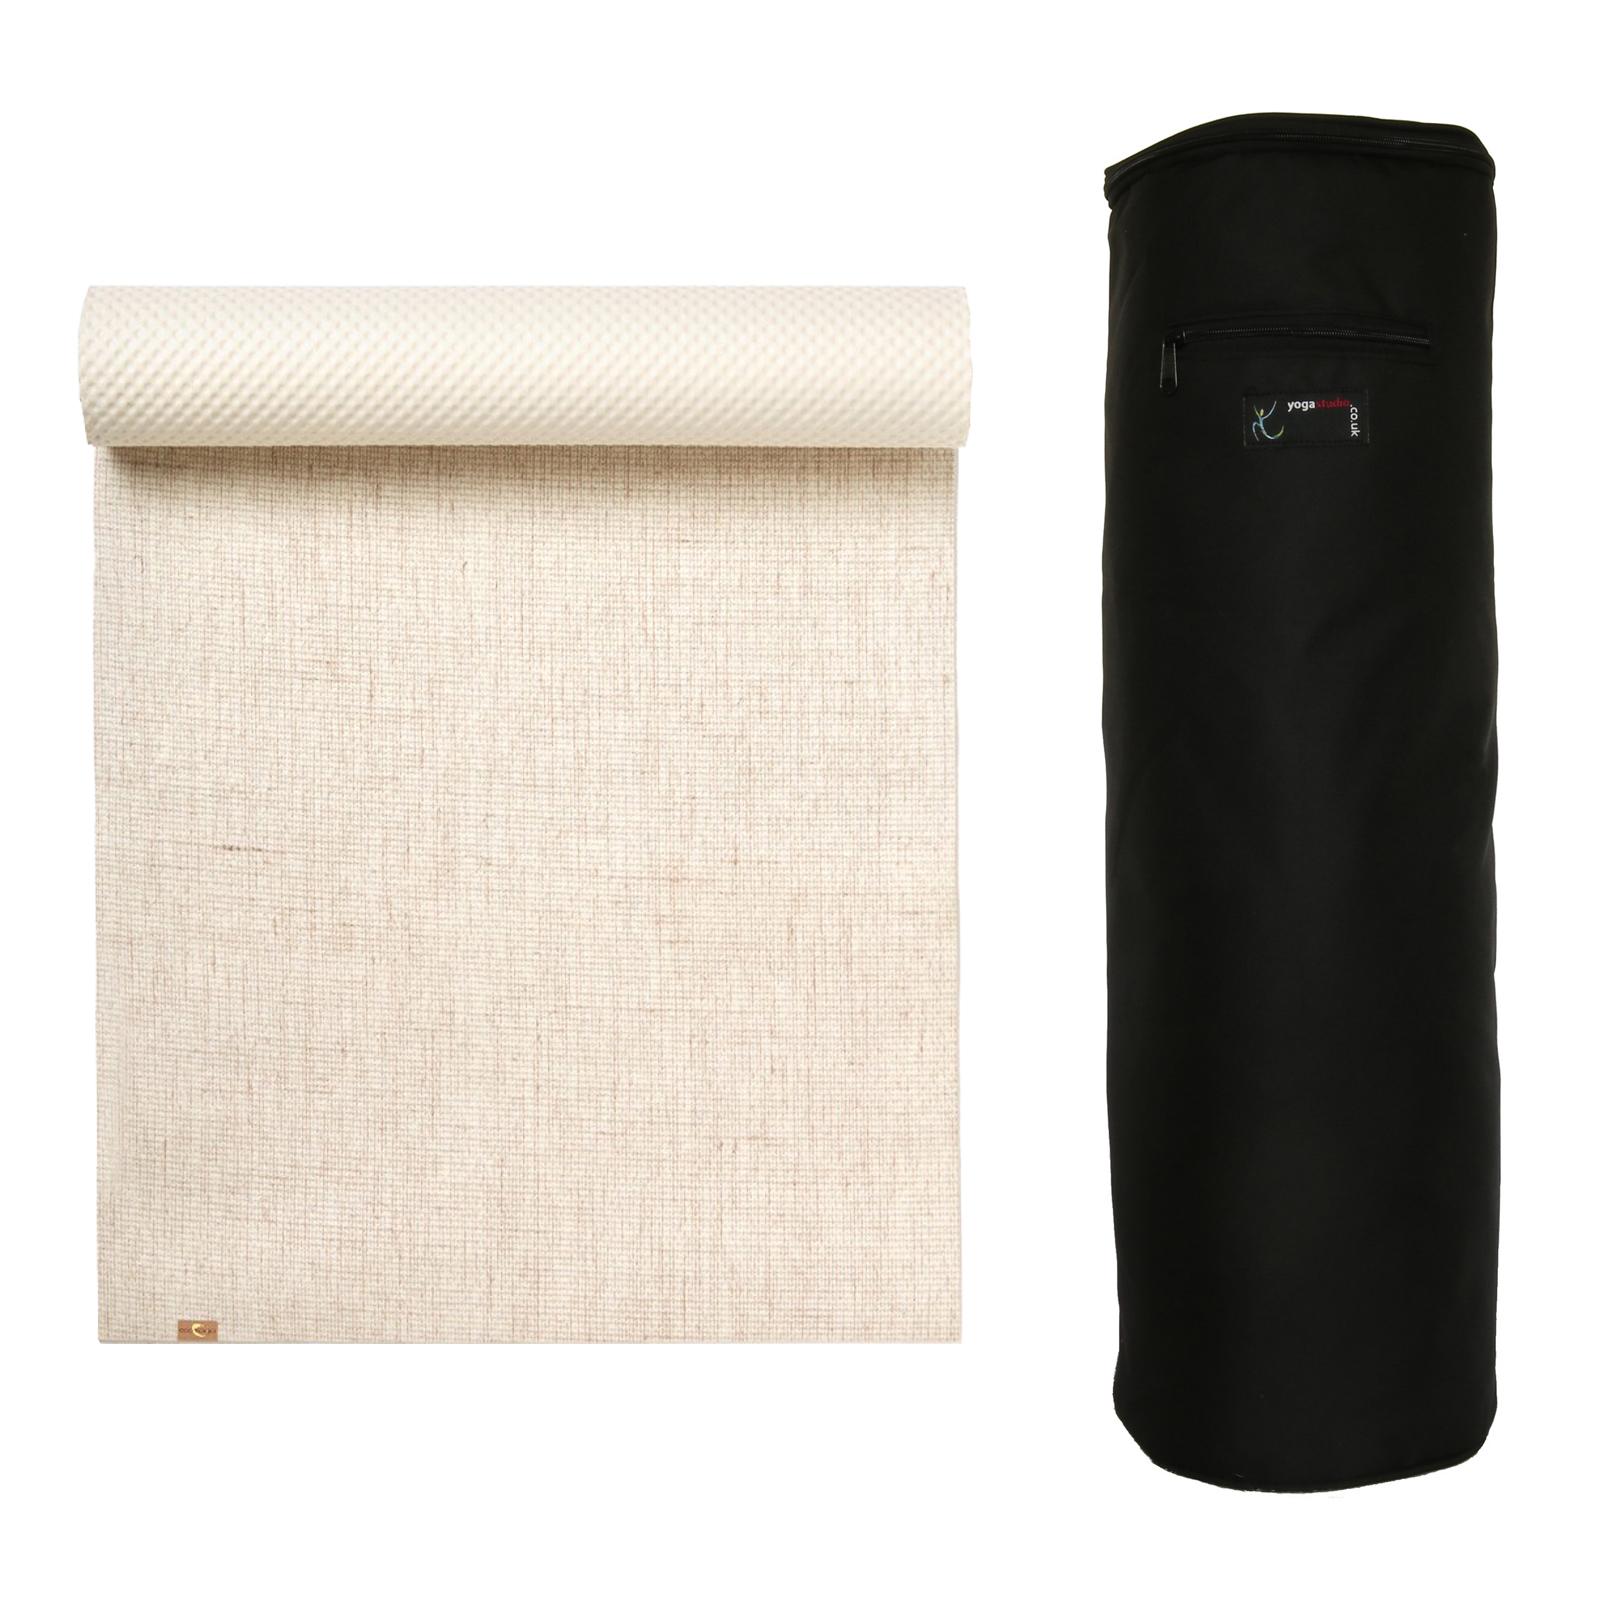 hot sale custom good texture Details about Yoga Studio - EcoYoga Kit Yoga Mat & Bag Combo Set - Various  Colours Available